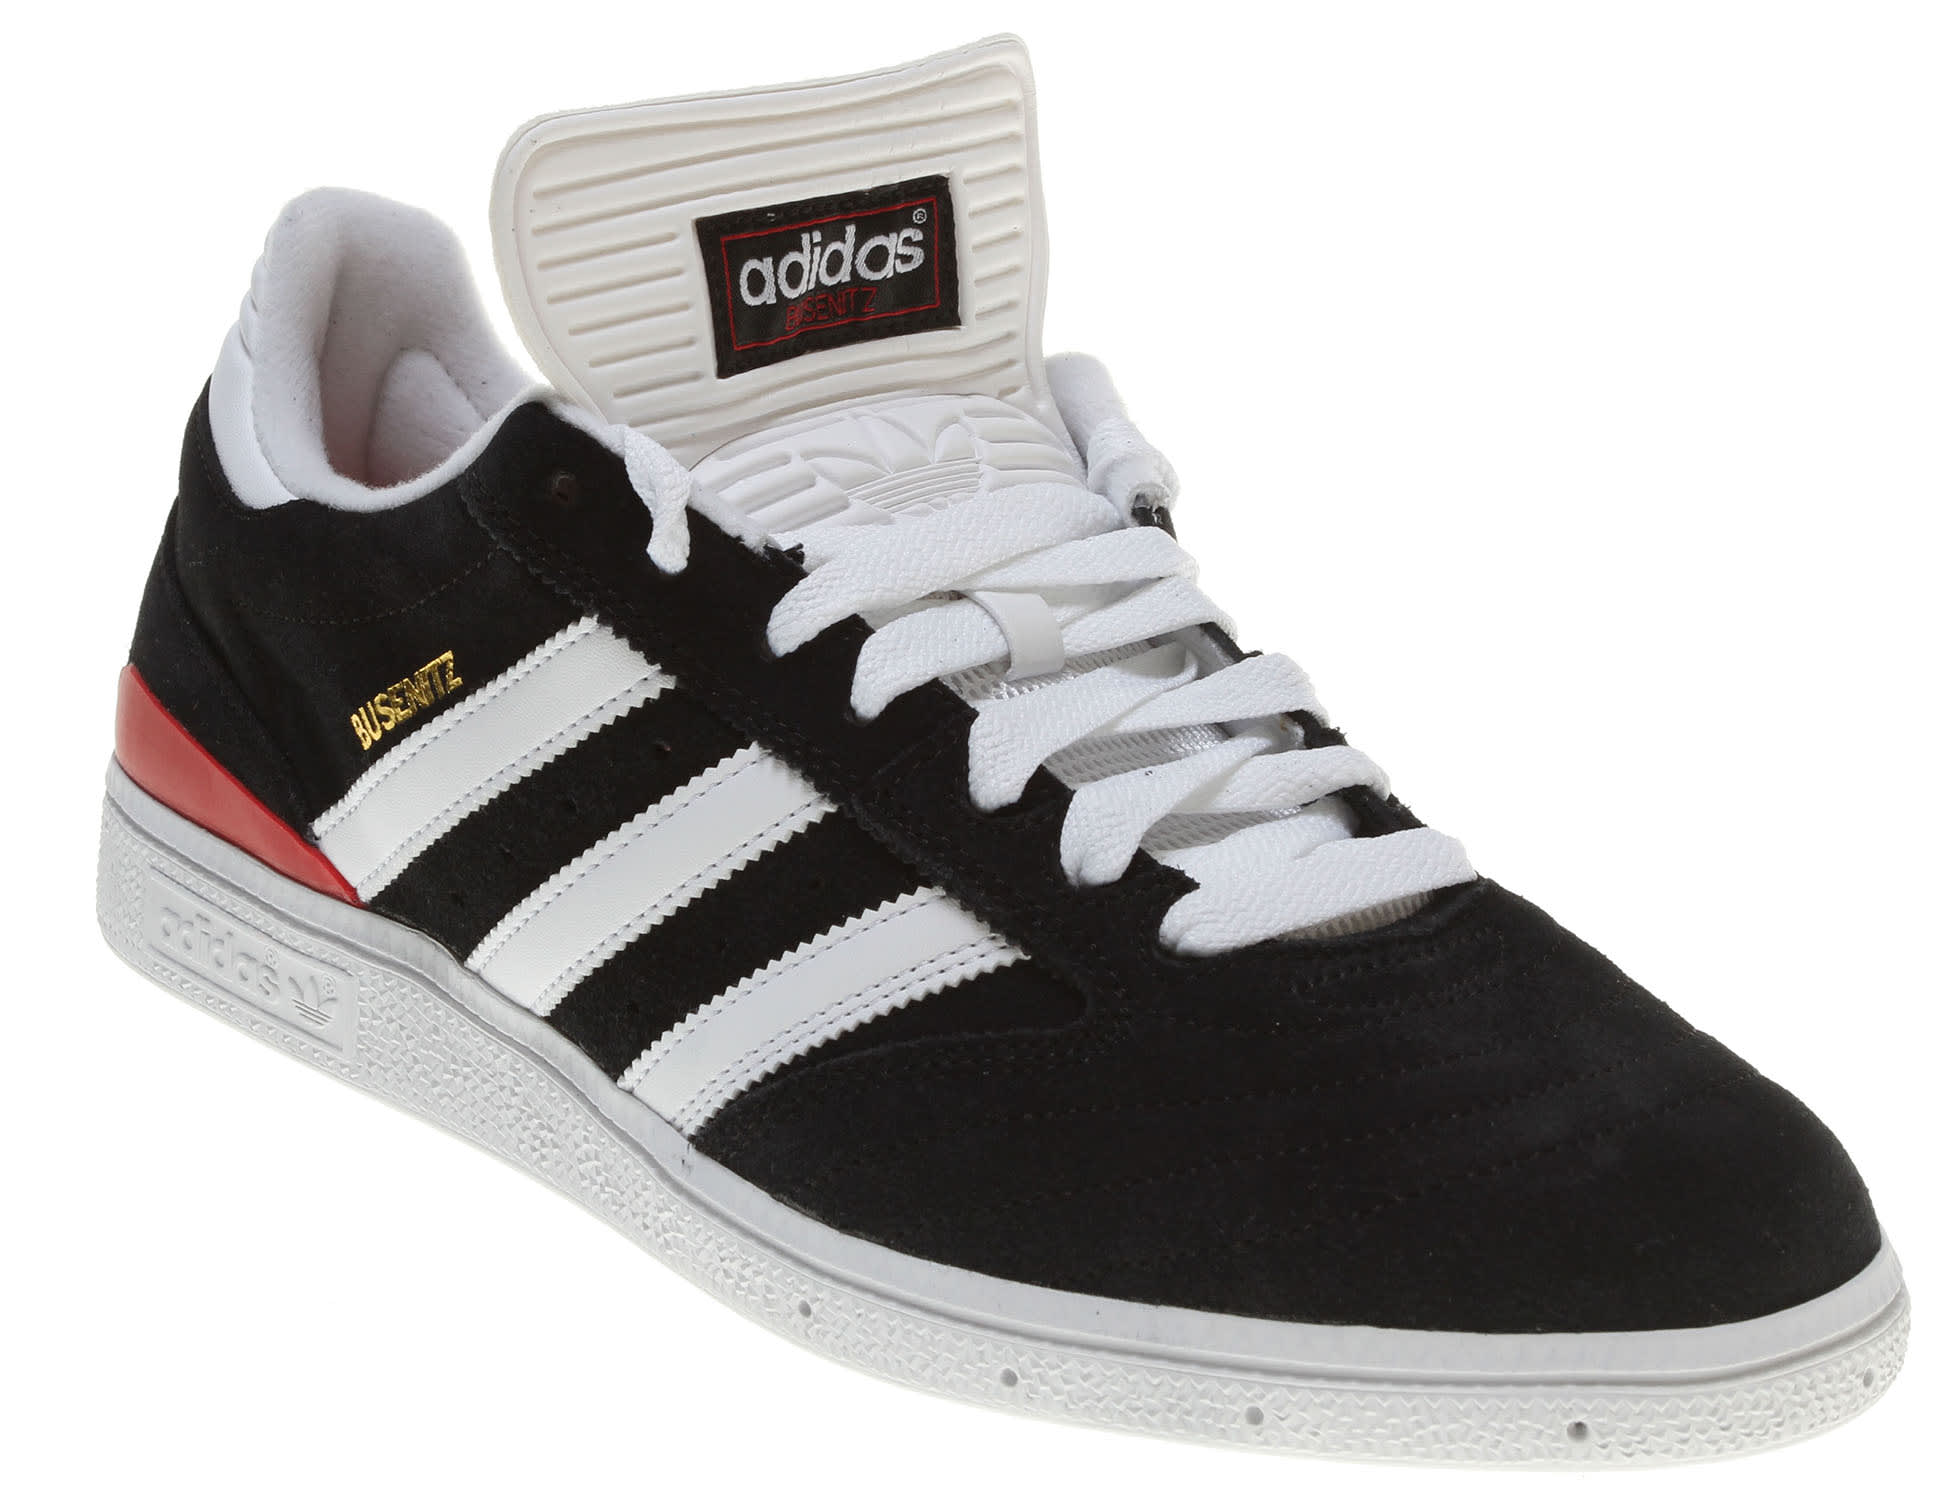 outlet store ecc37 02069 Adidas Busenitz Pro Skate Shoes - thumbnail 2